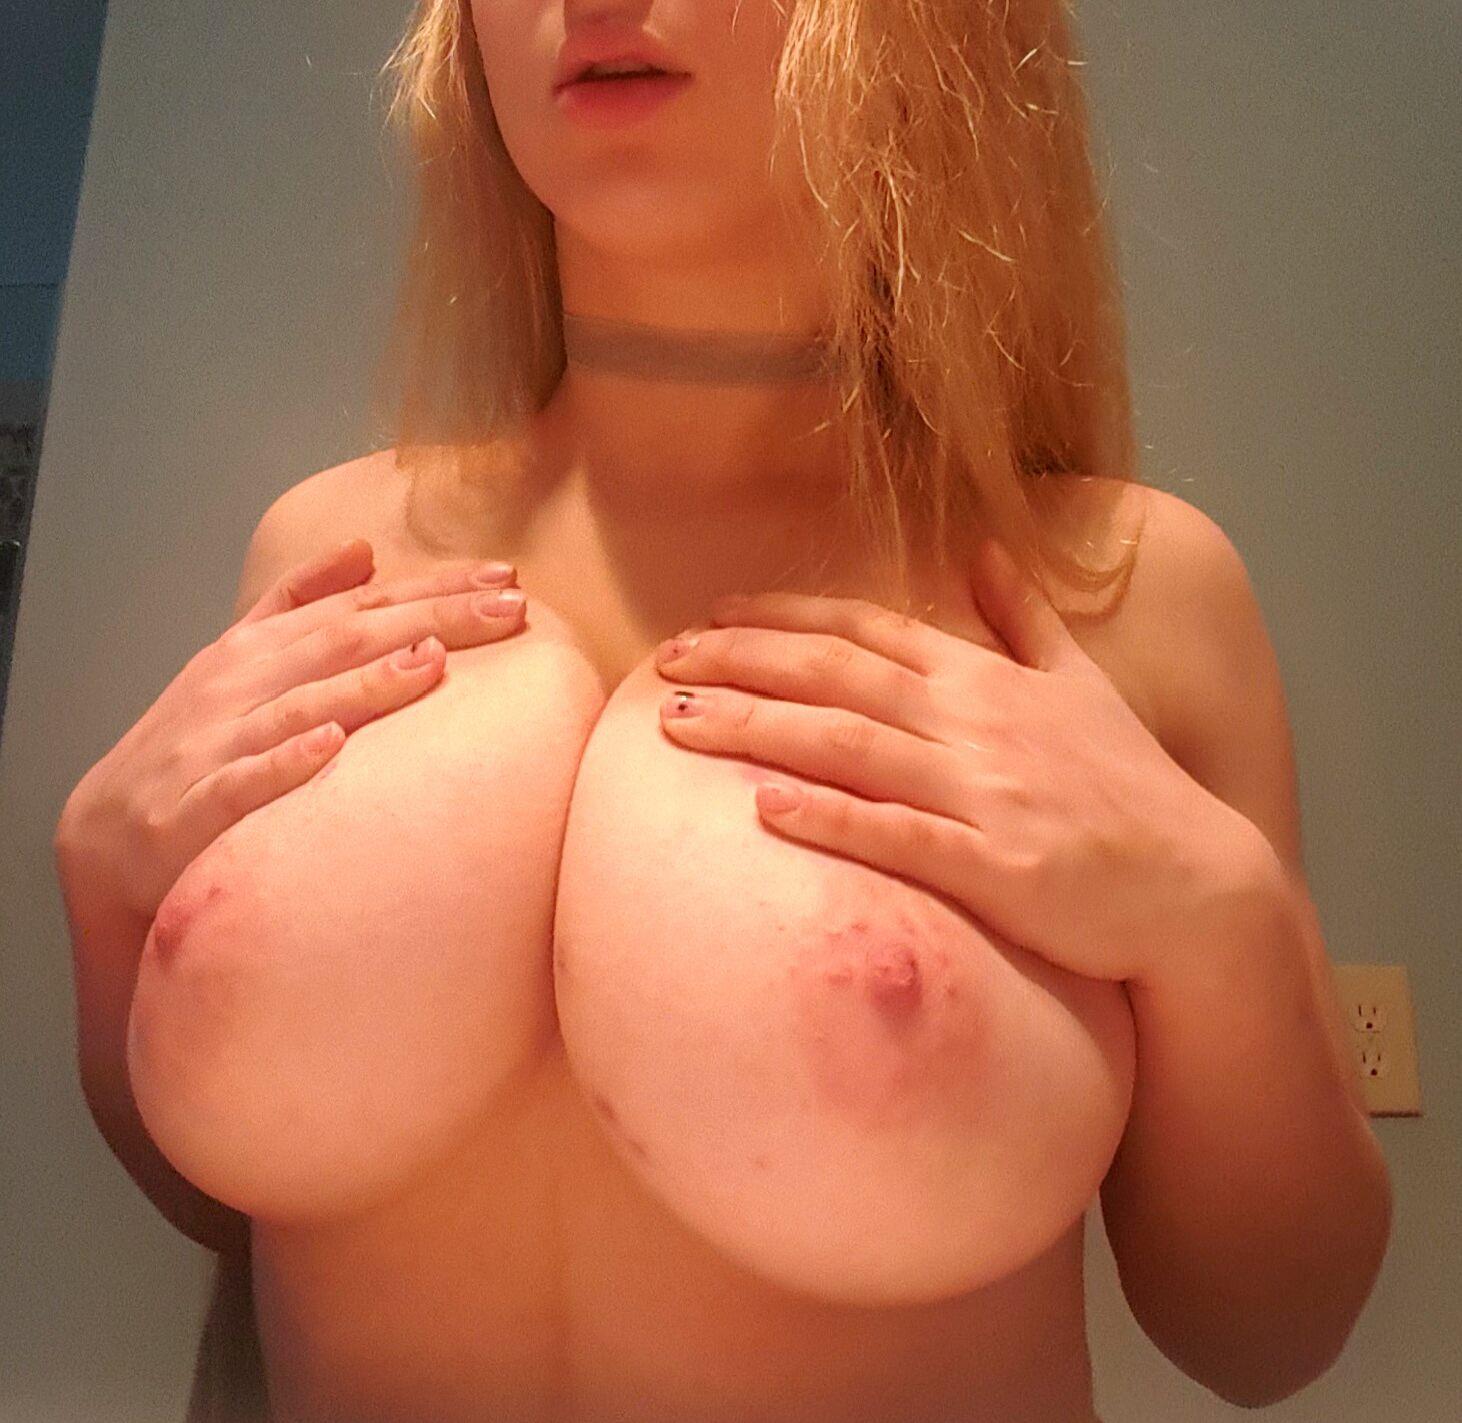 porno with lisa ann online